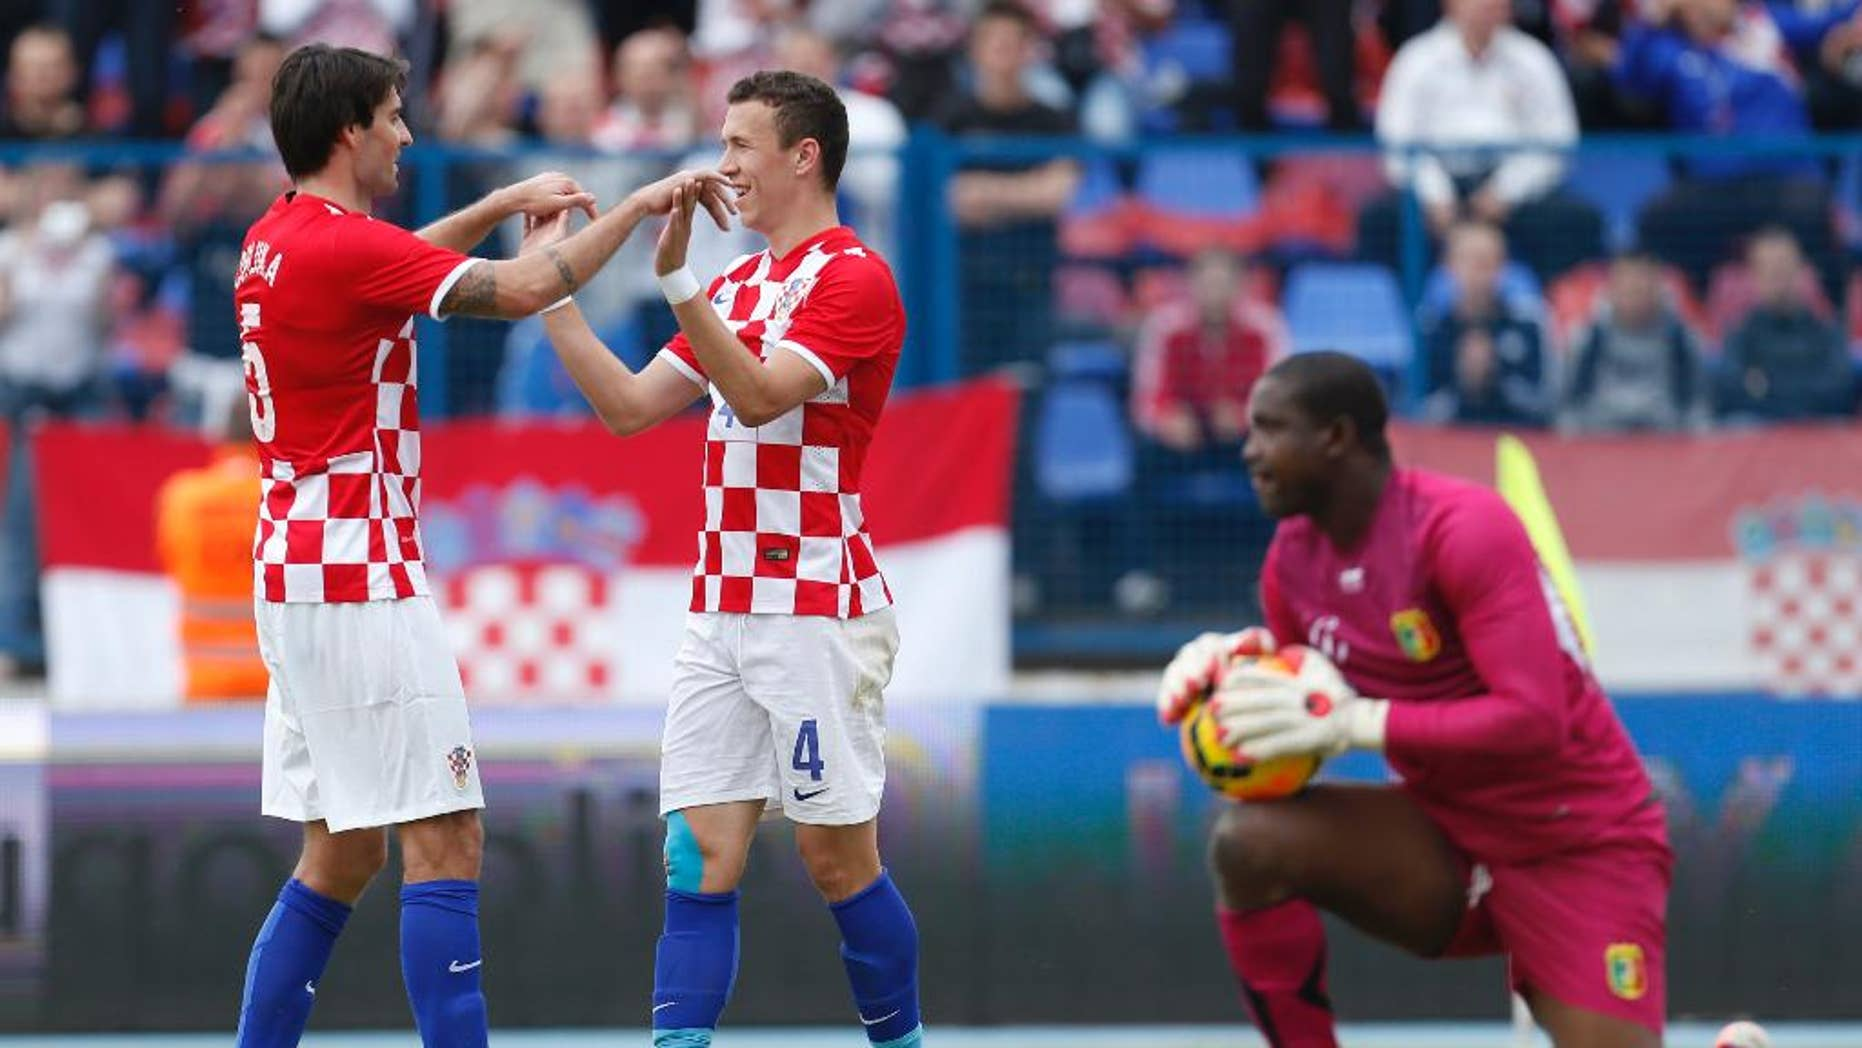 Croatia'sIvan Perisic, center, celebrates his second goal with Vedran Corluka during the internationa friendly soccer match between Croatia and Mali, in Osijek, Croatia, Saturday, May 31, 2014. (AP Photo/Darko Bandic)